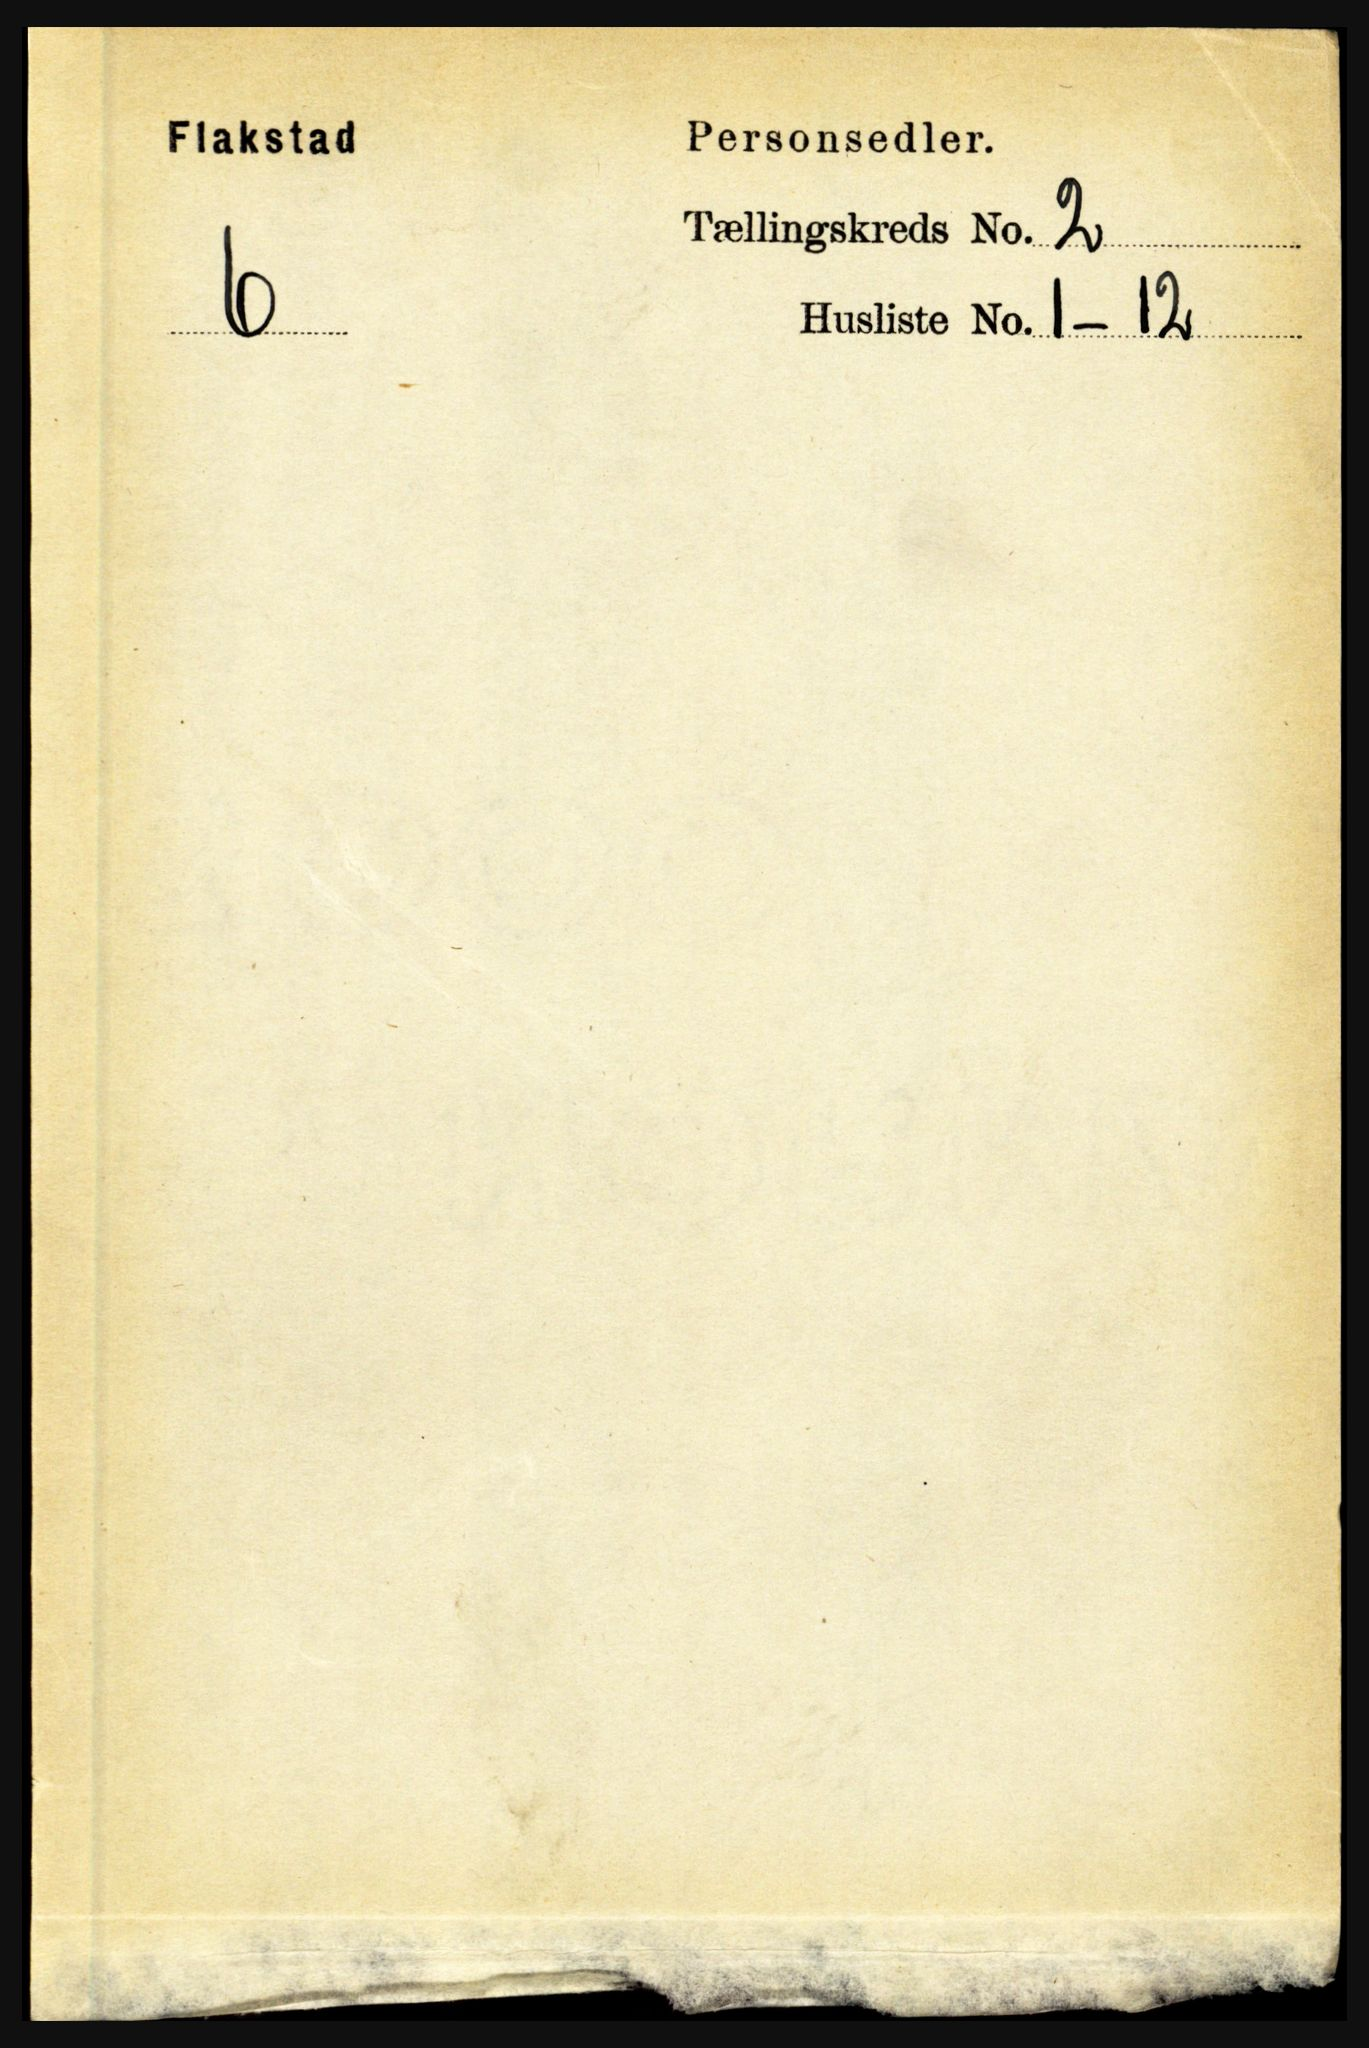 RA, Folketelling 1891 for 1859 Flakstad herred, 1891, s. 597